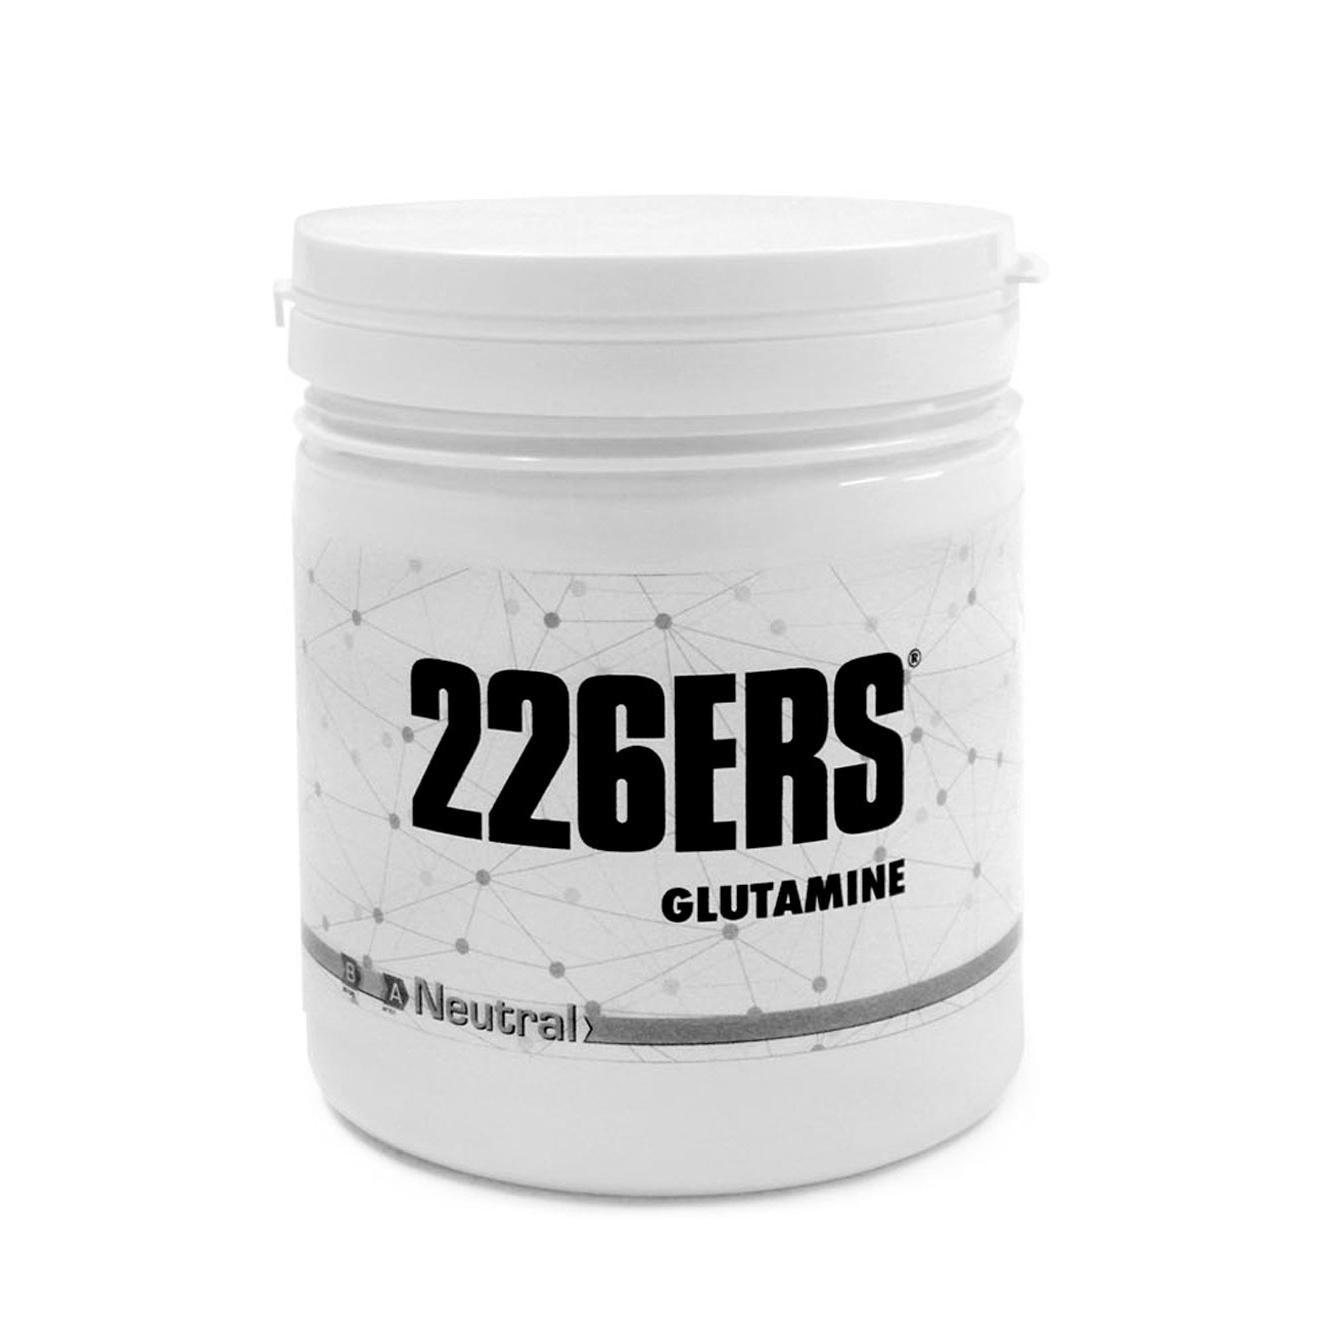 226ERS | Glutamine-2